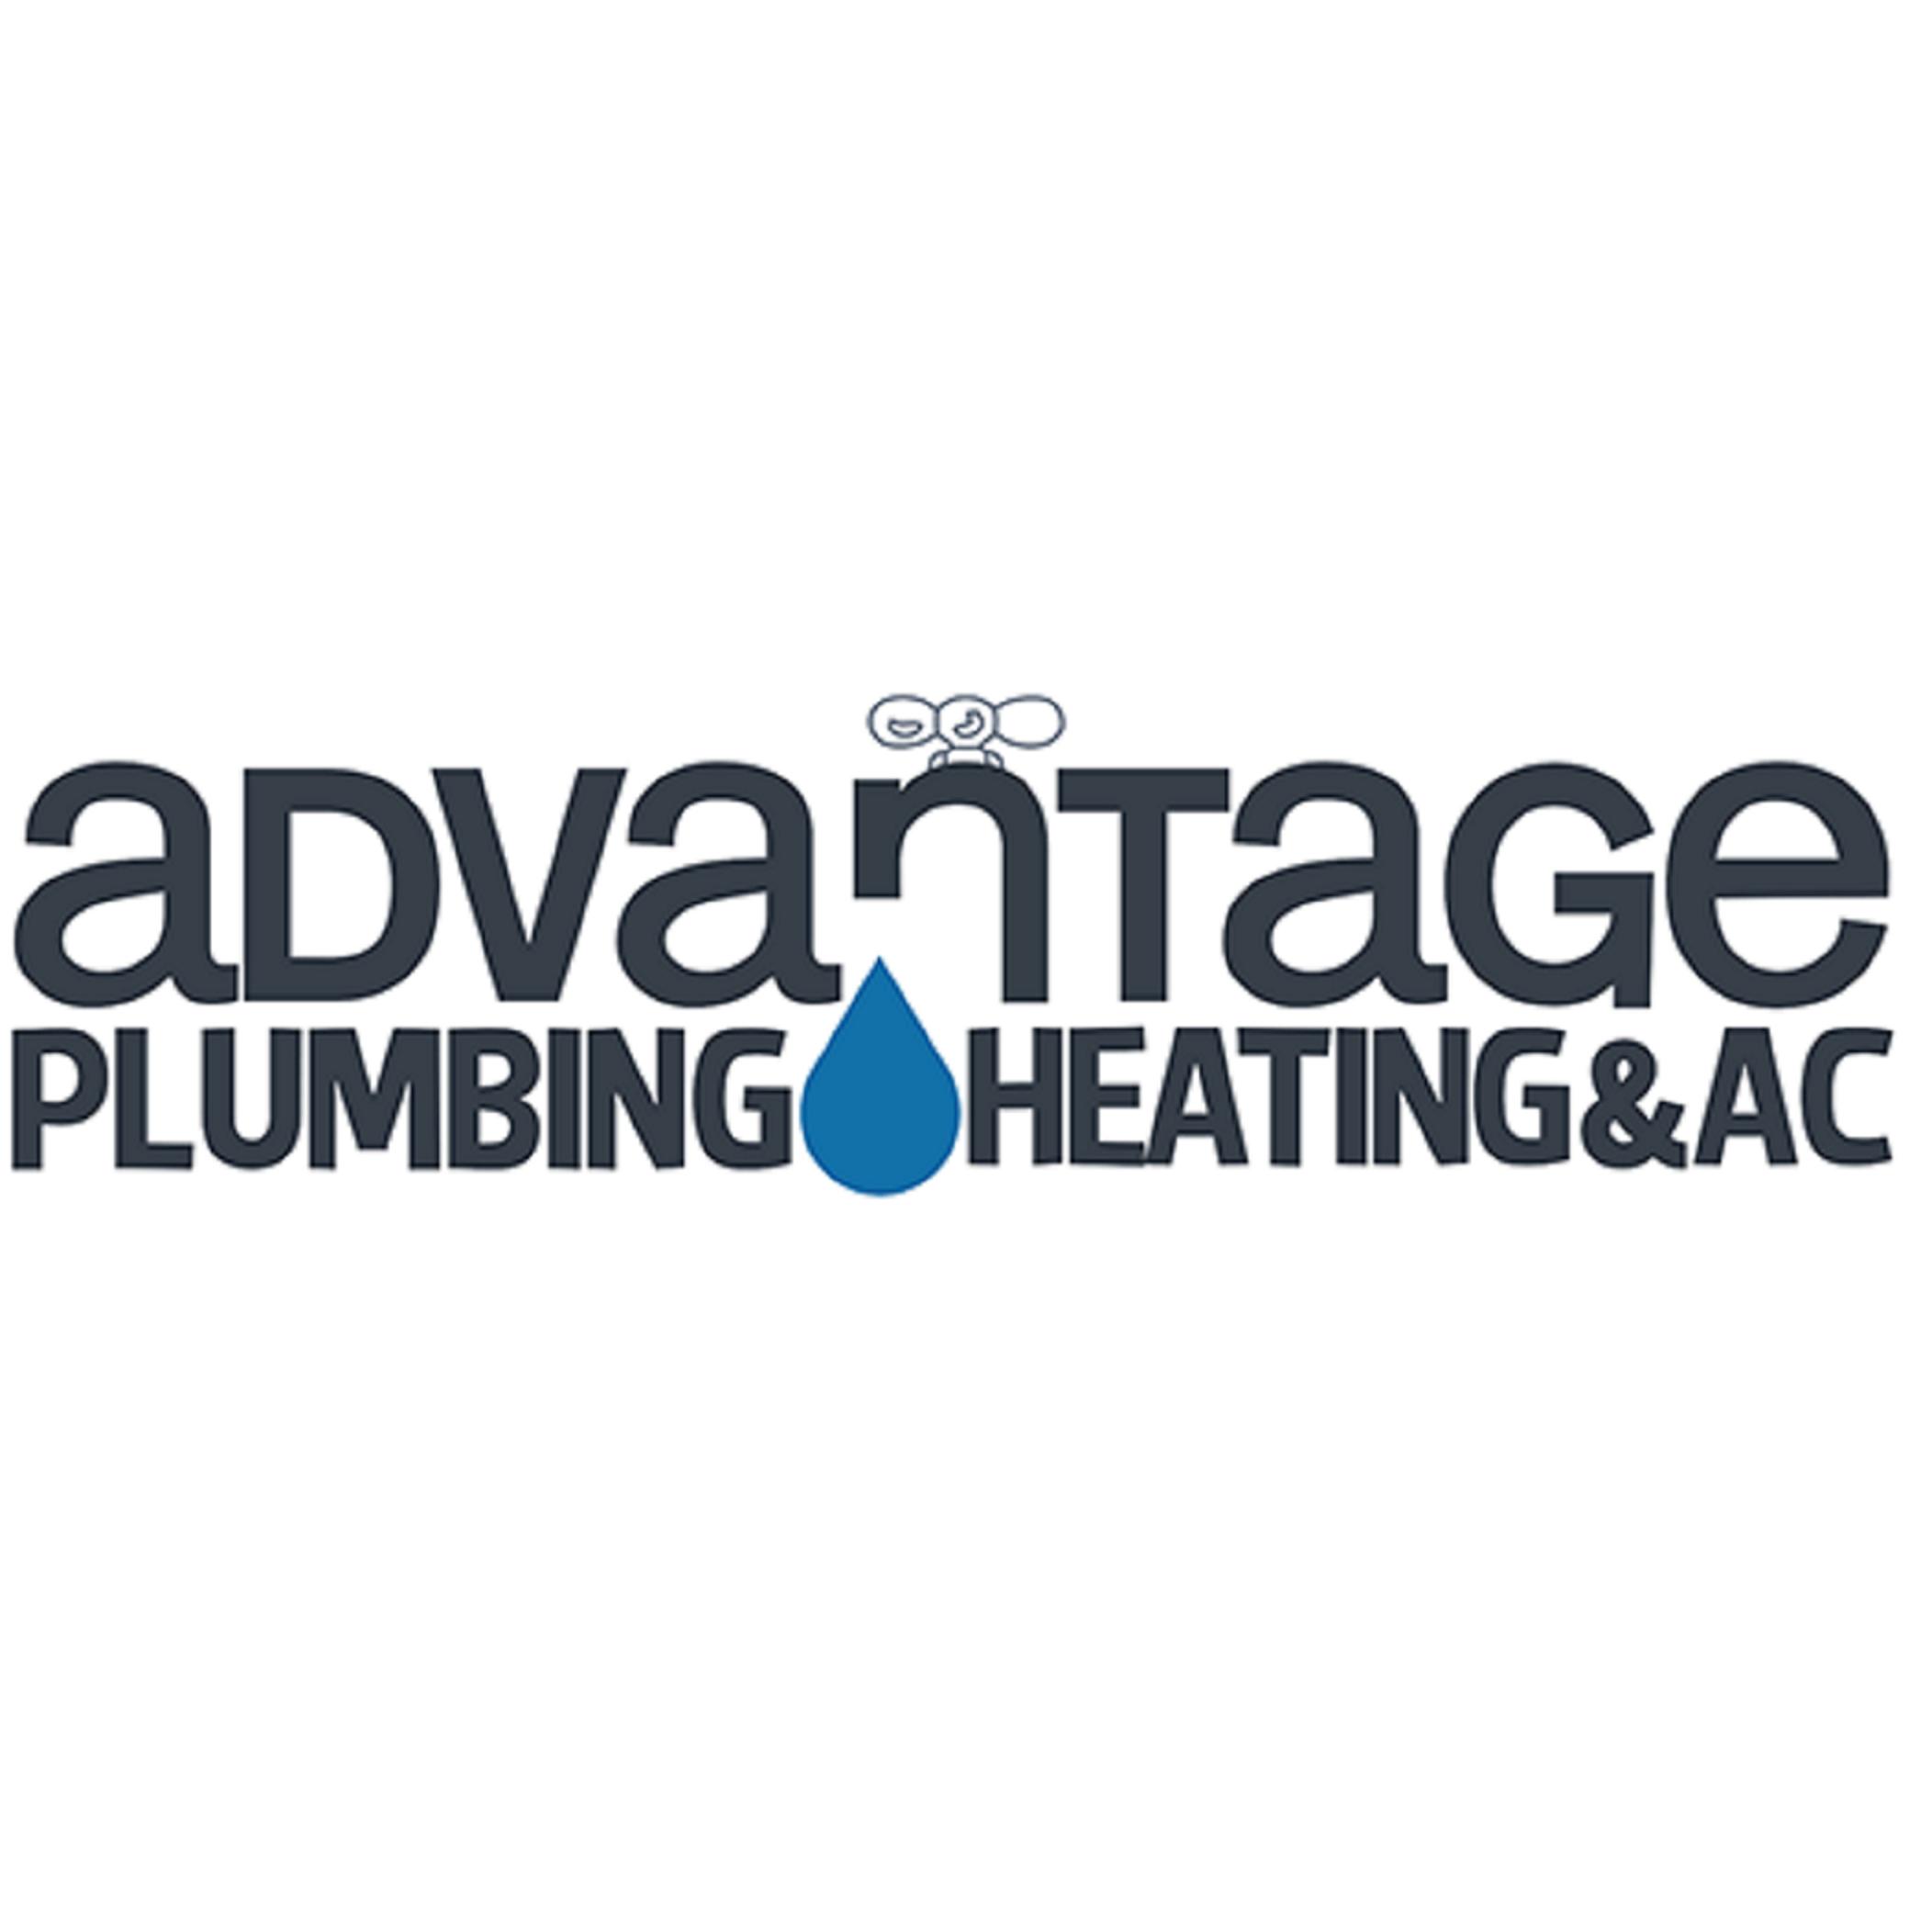 Advantage Plumbing, Heating & A/C